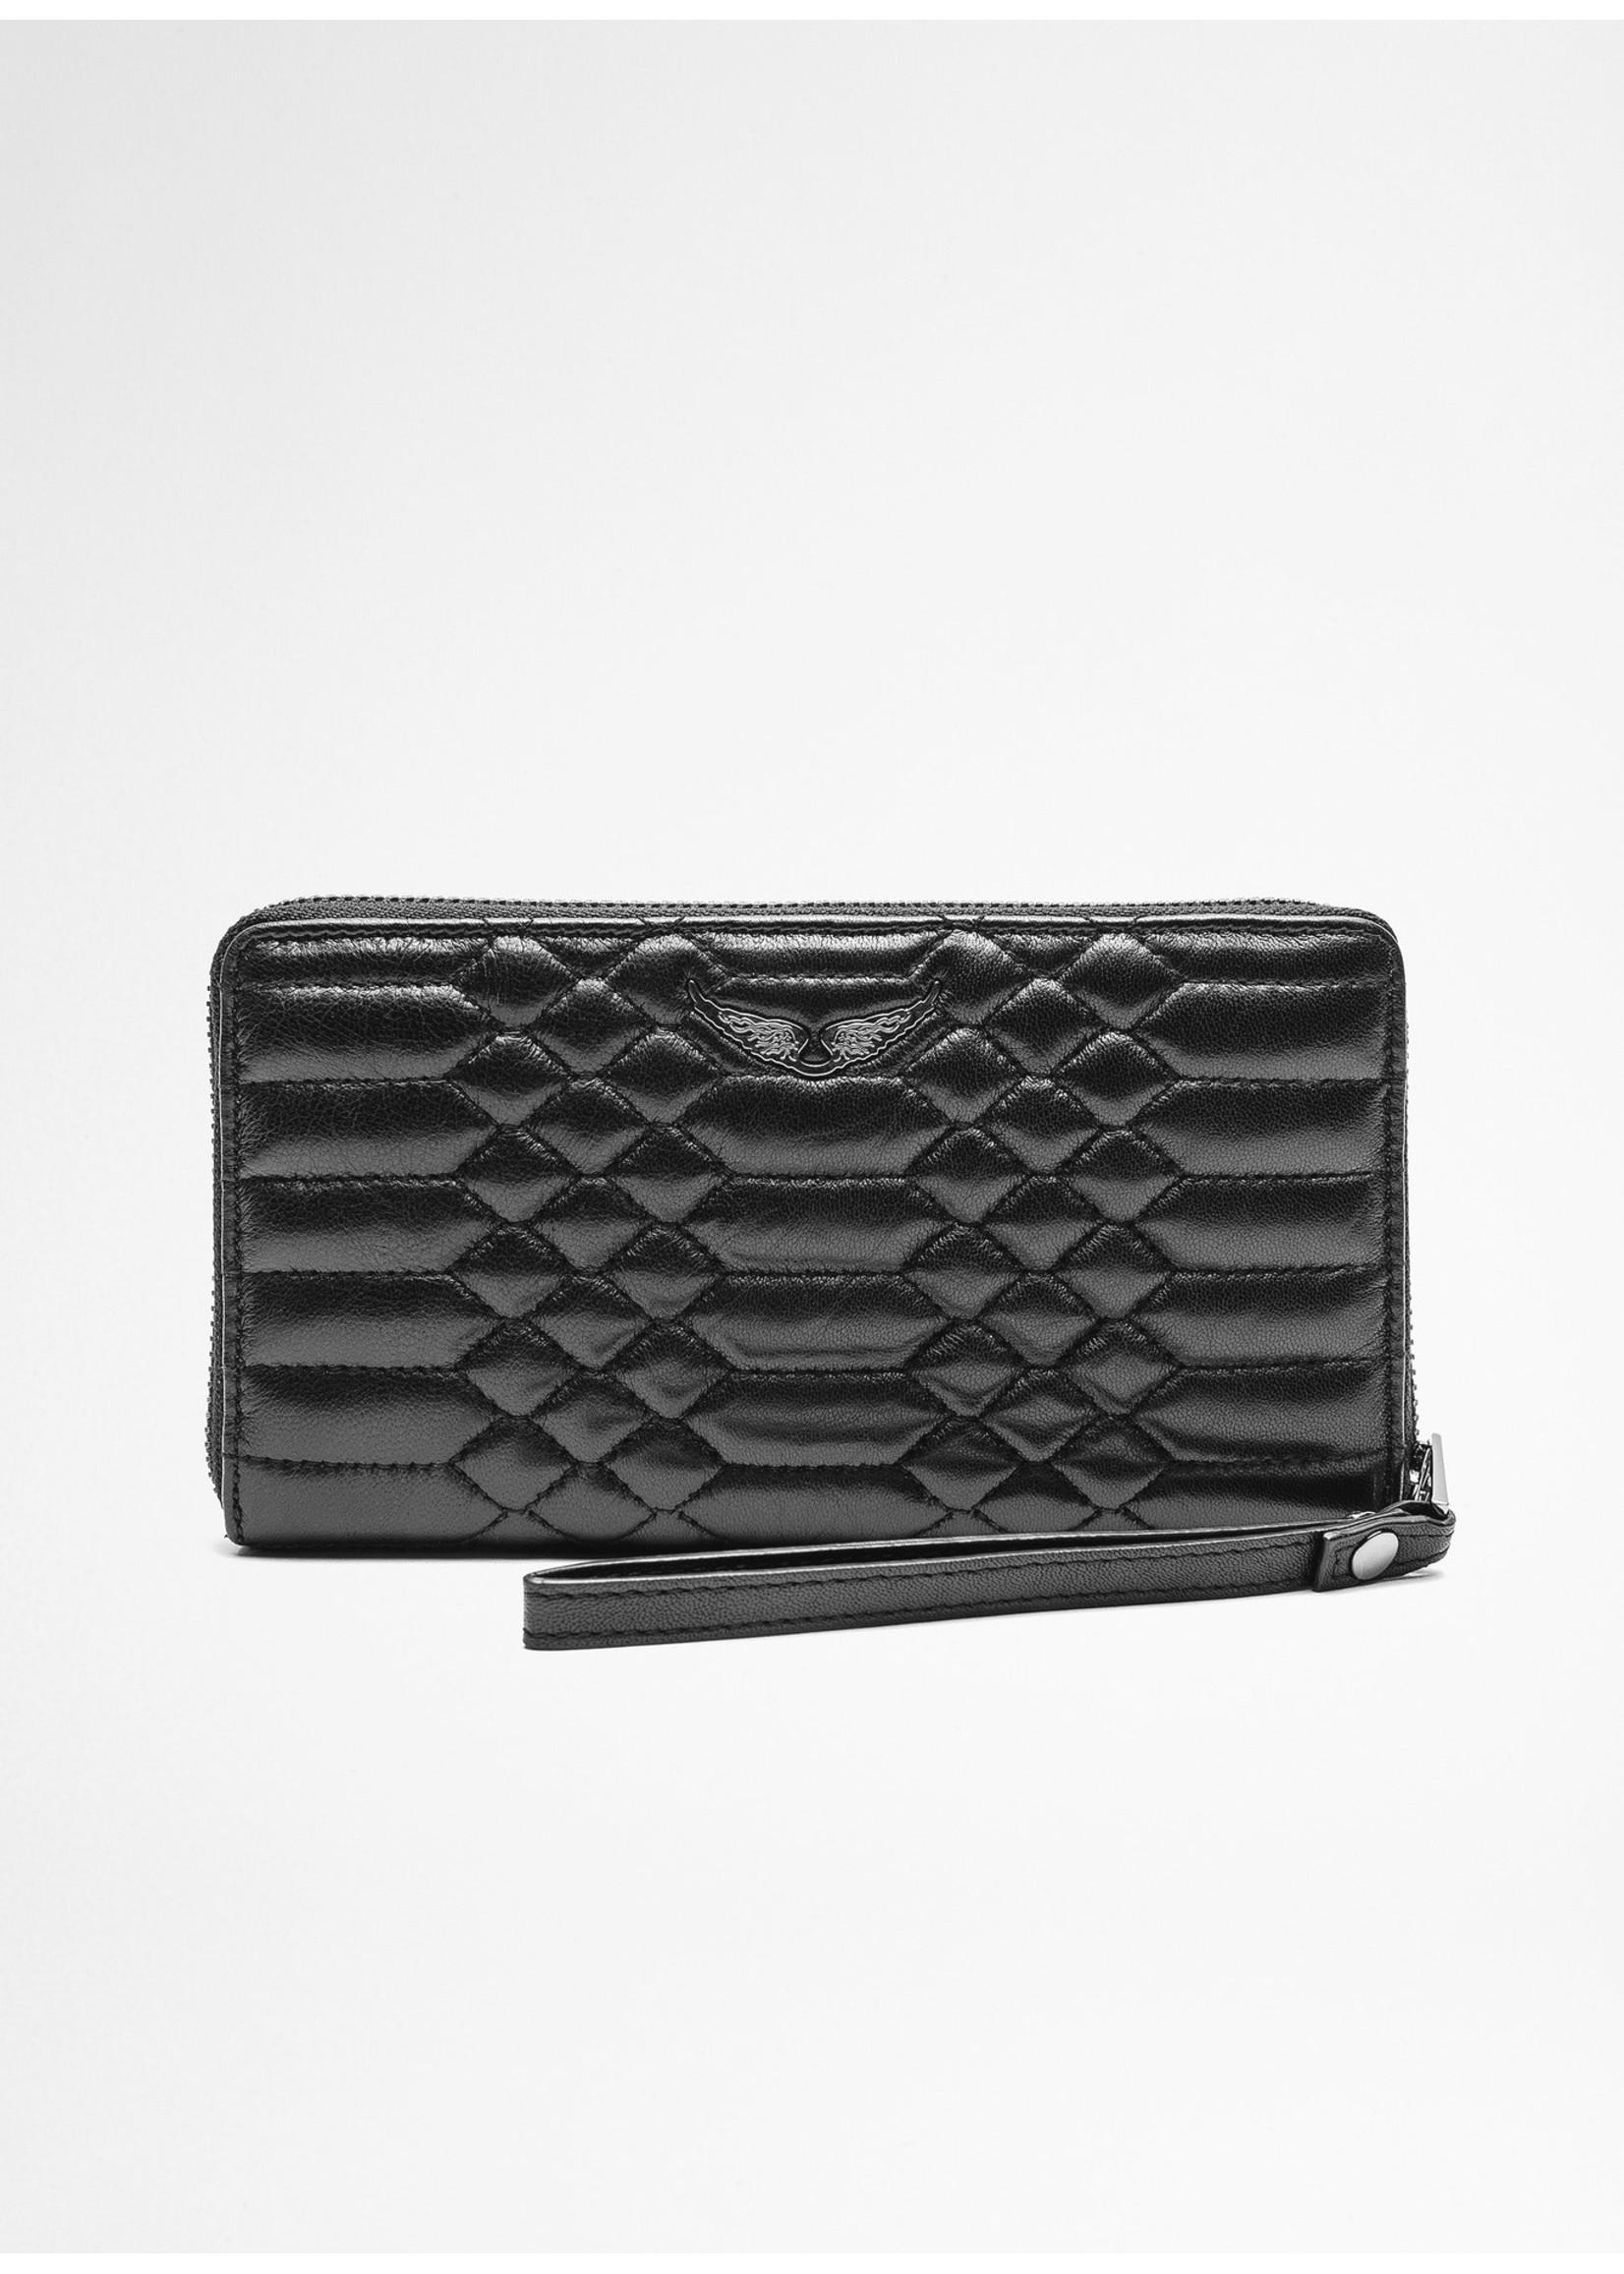 Zadig & Voltaire Compagnon matelasse wallet black